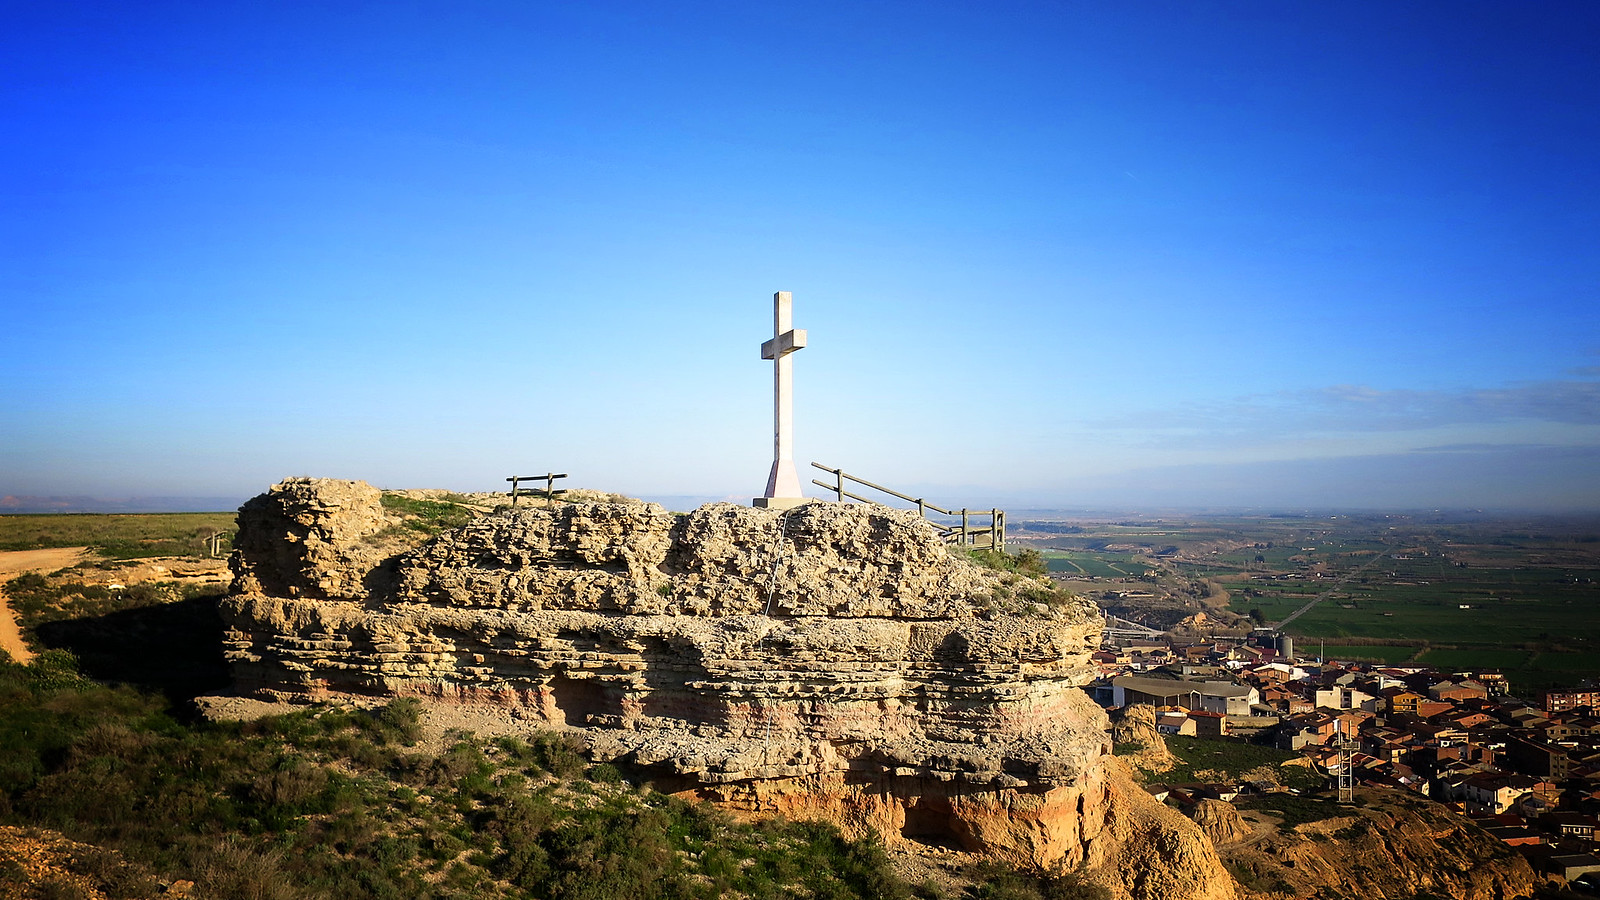 Las Ripas de Alcolea: Santa Cruz - Tozal Redondo - Codera - Ermita de Chalamera